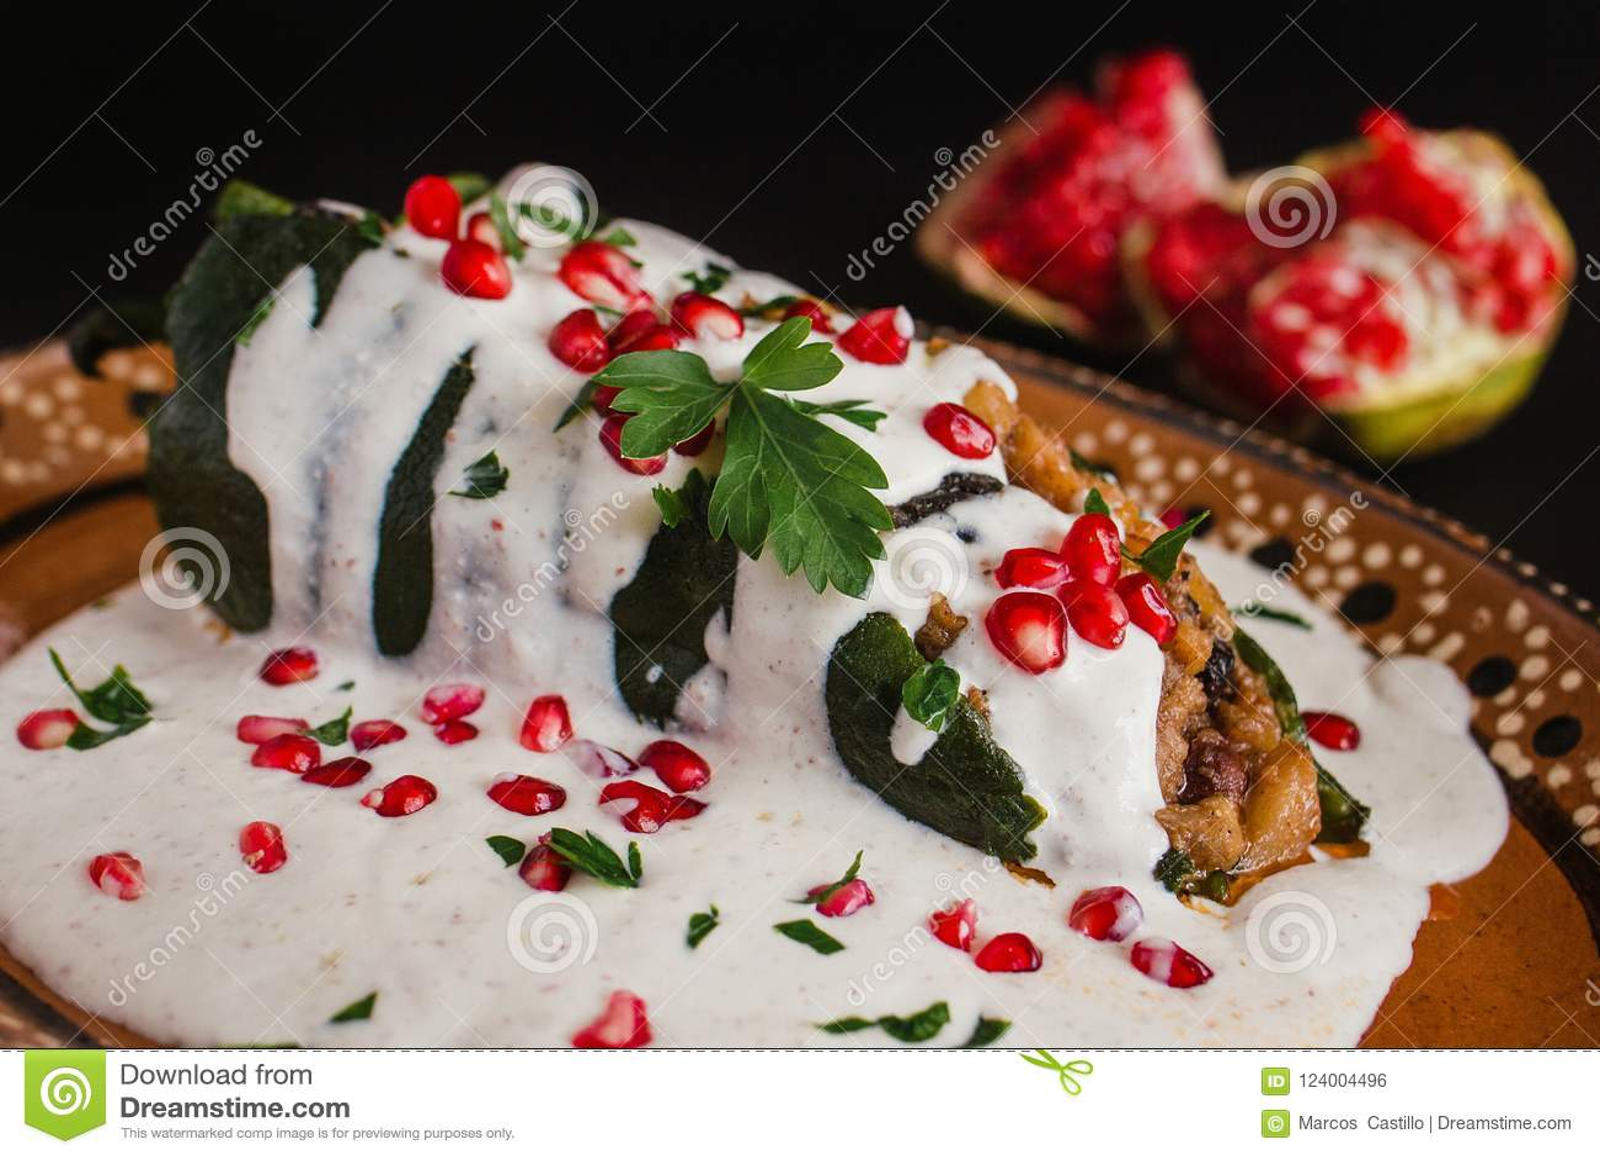 Chiles En Nogada Traditional Mexican Cuisine In Puebla Mexico Stock Photo Image Of Pepper Bark 124004496